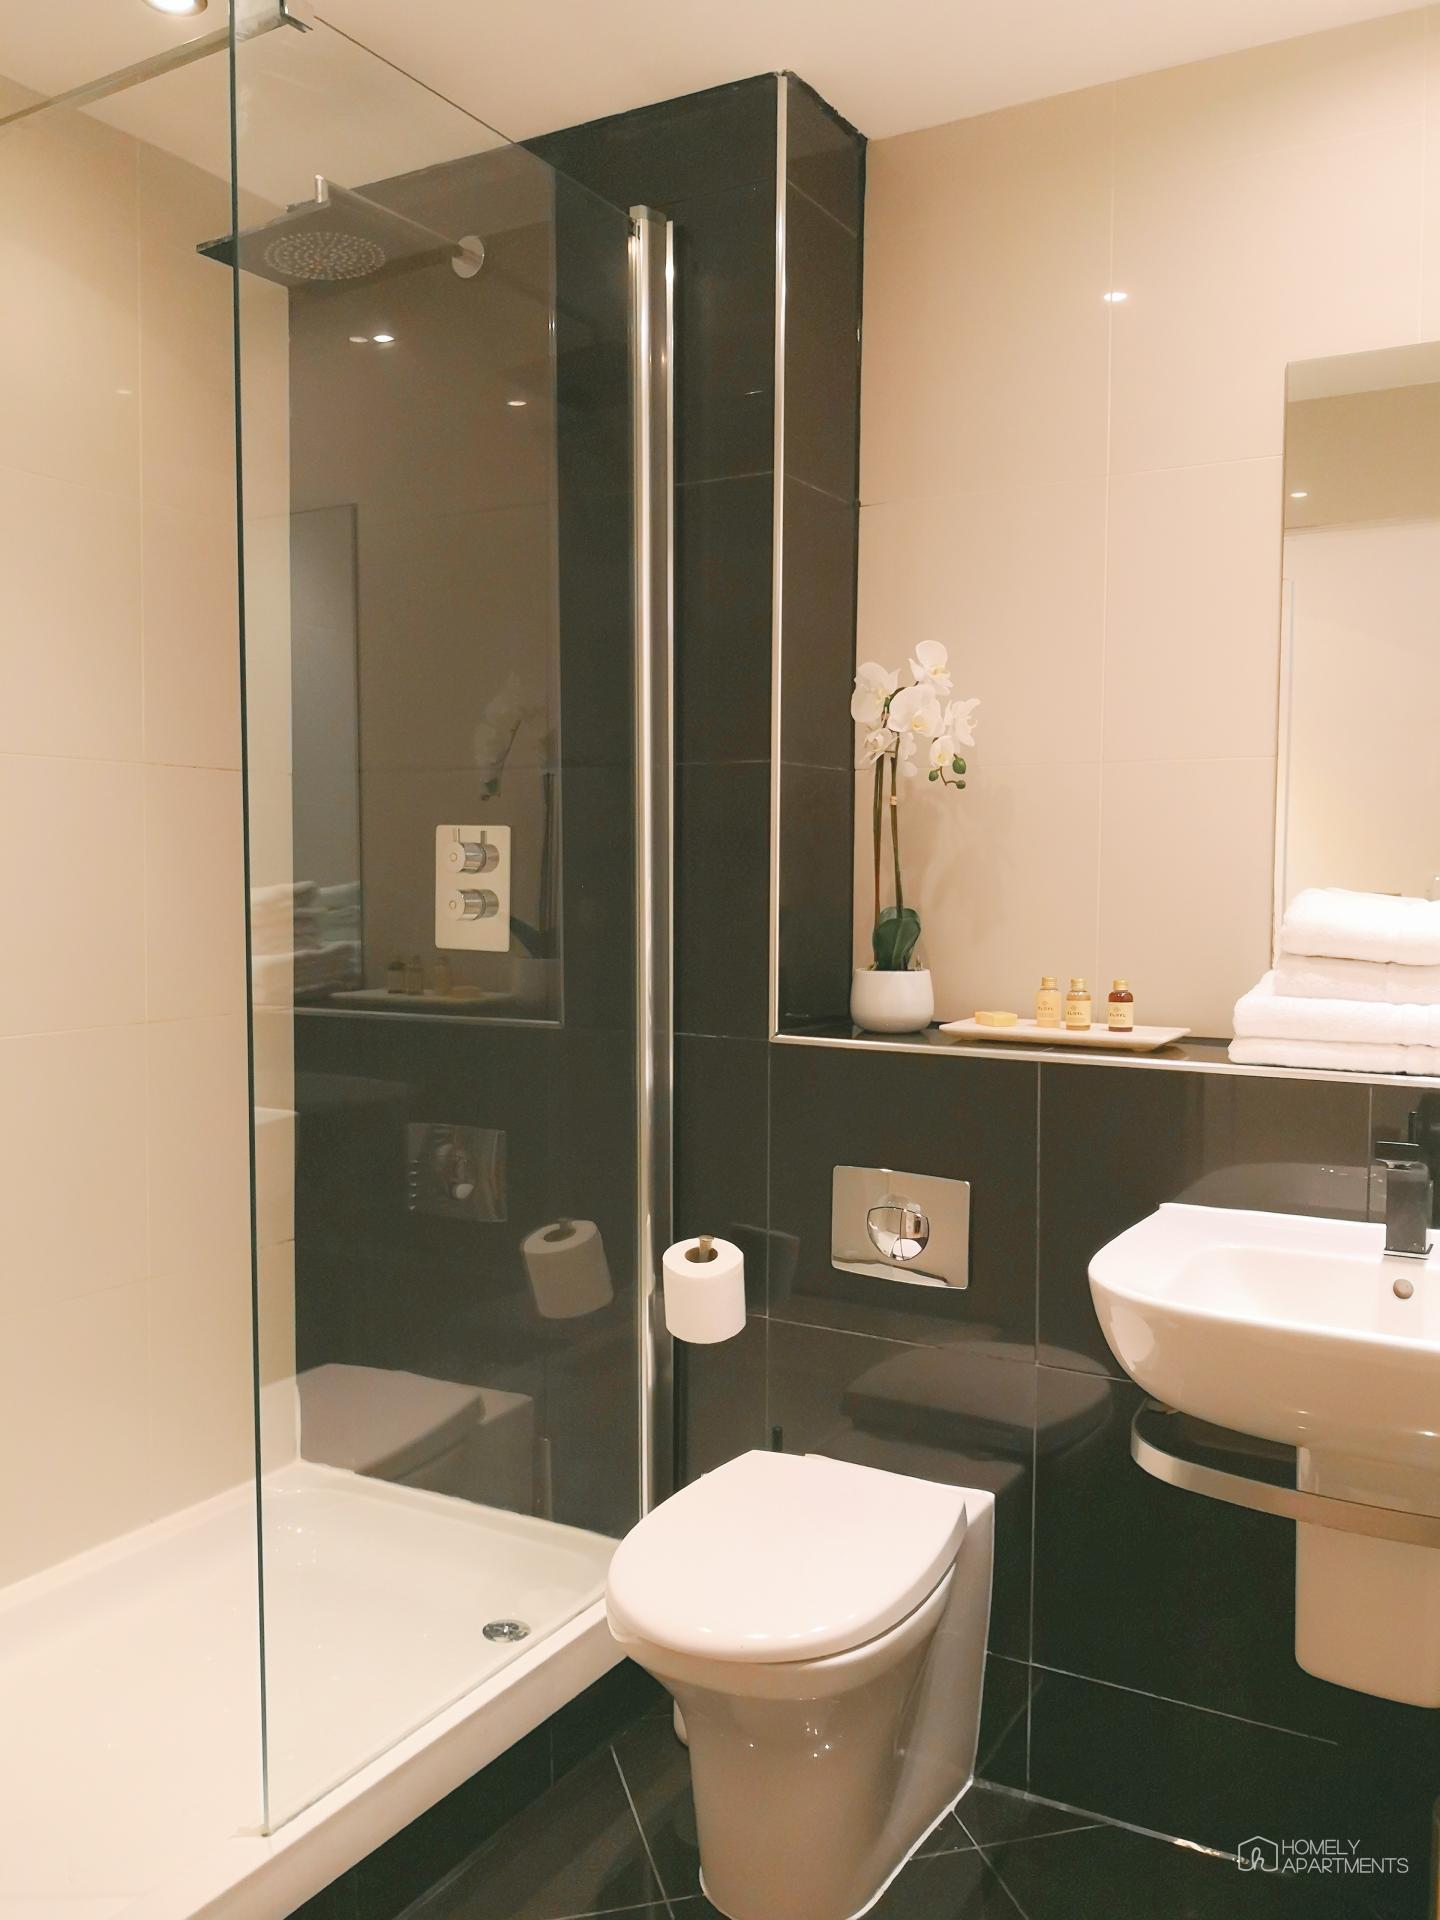 Bathroom at Blonk Street Apartments - Citybase Apartments